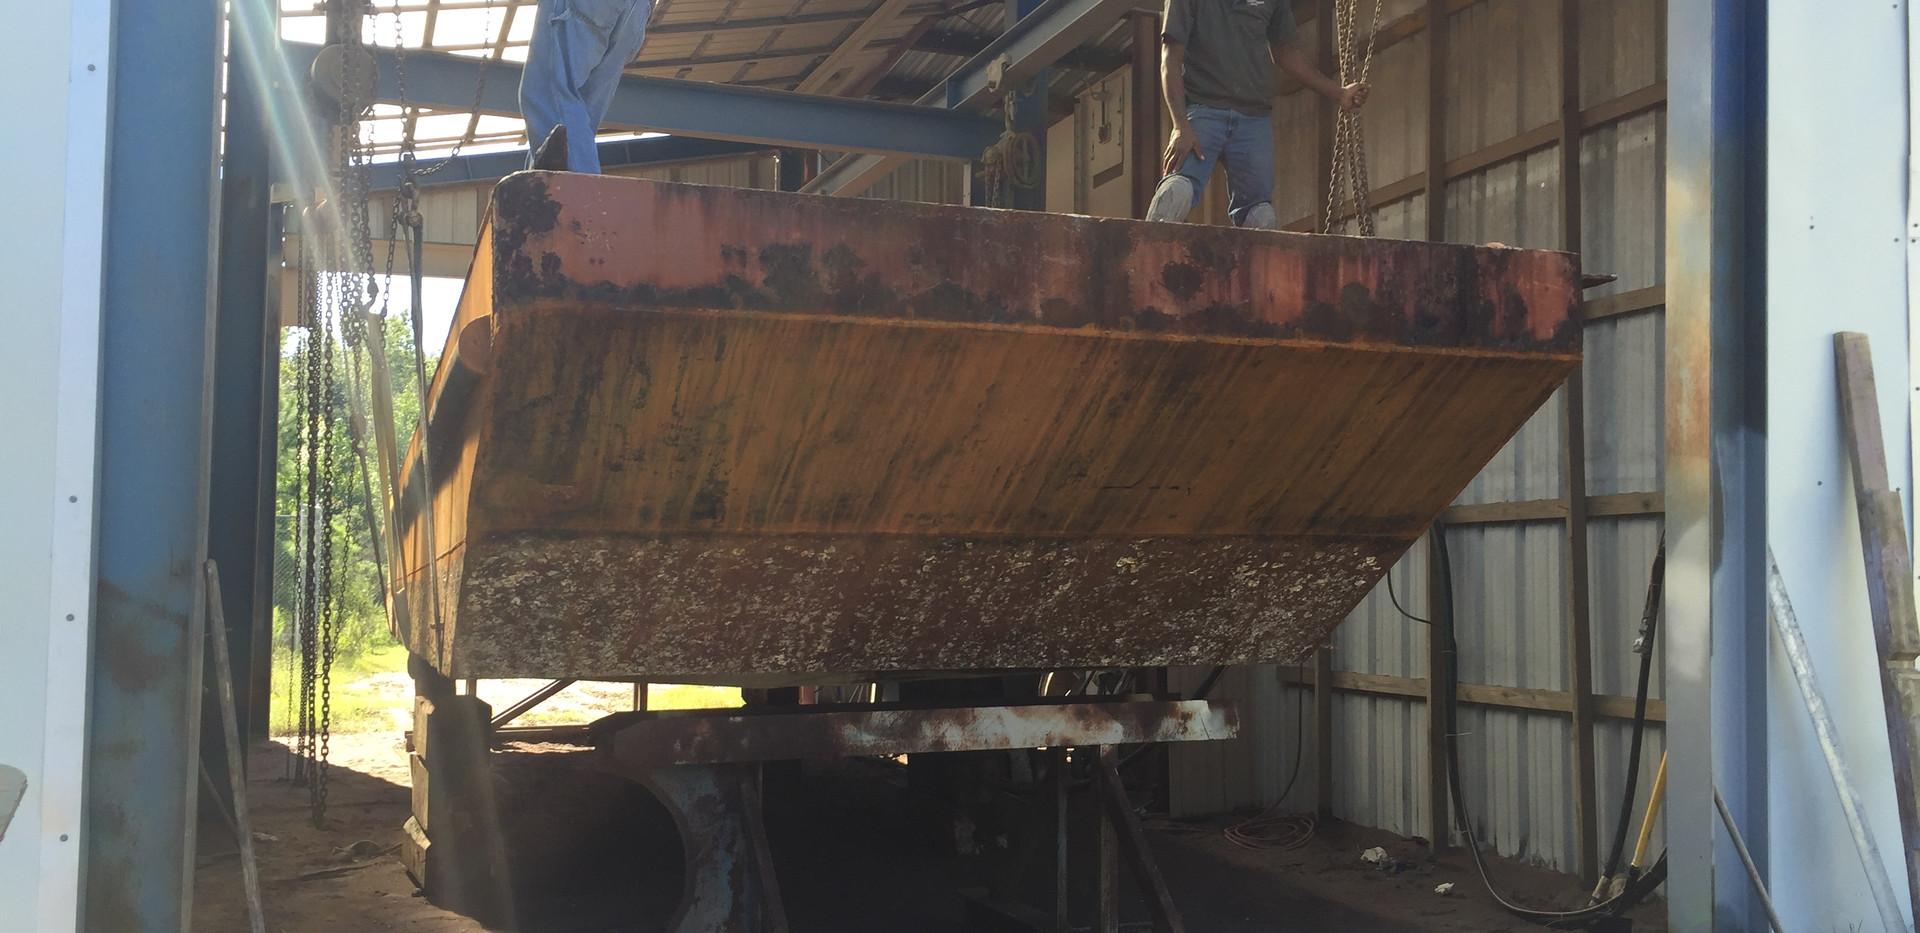 barge4.JPG